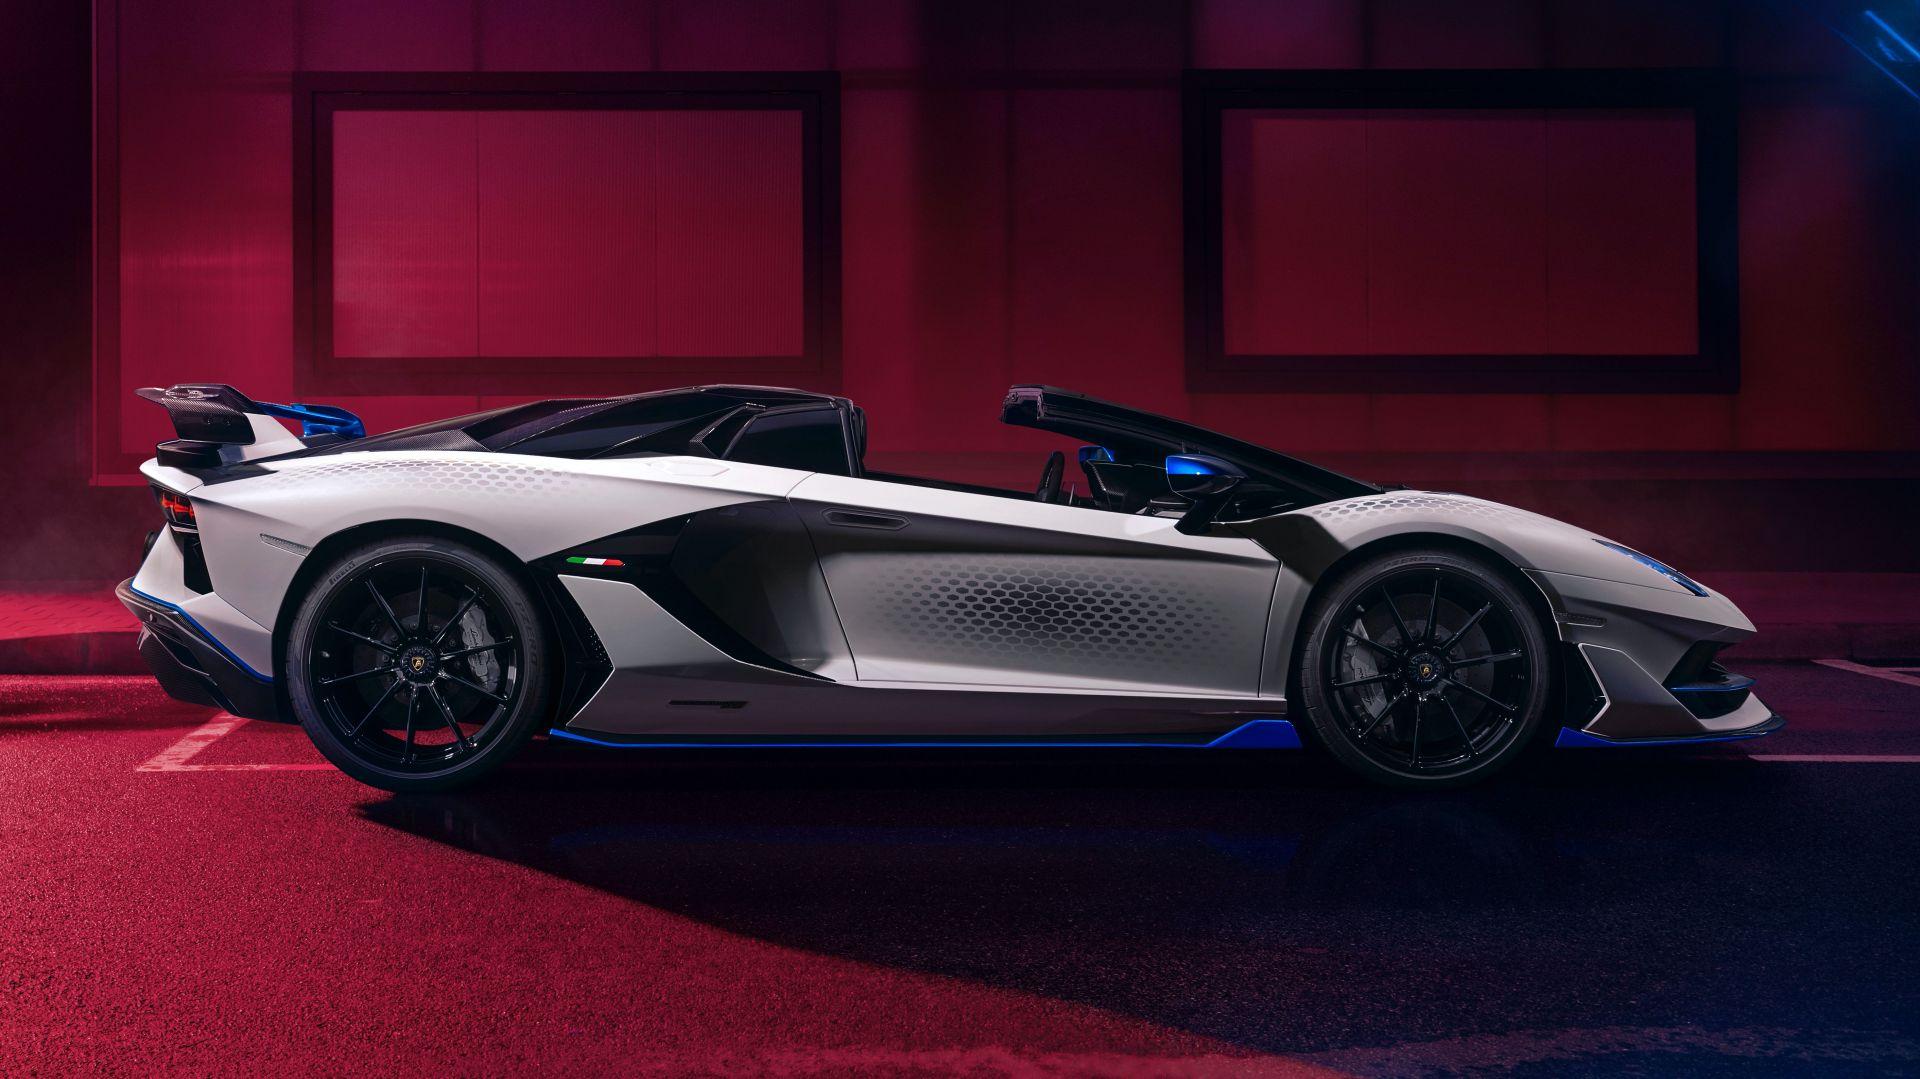 Lamborghini-Aventador-SVJ-Xago-Edition-4